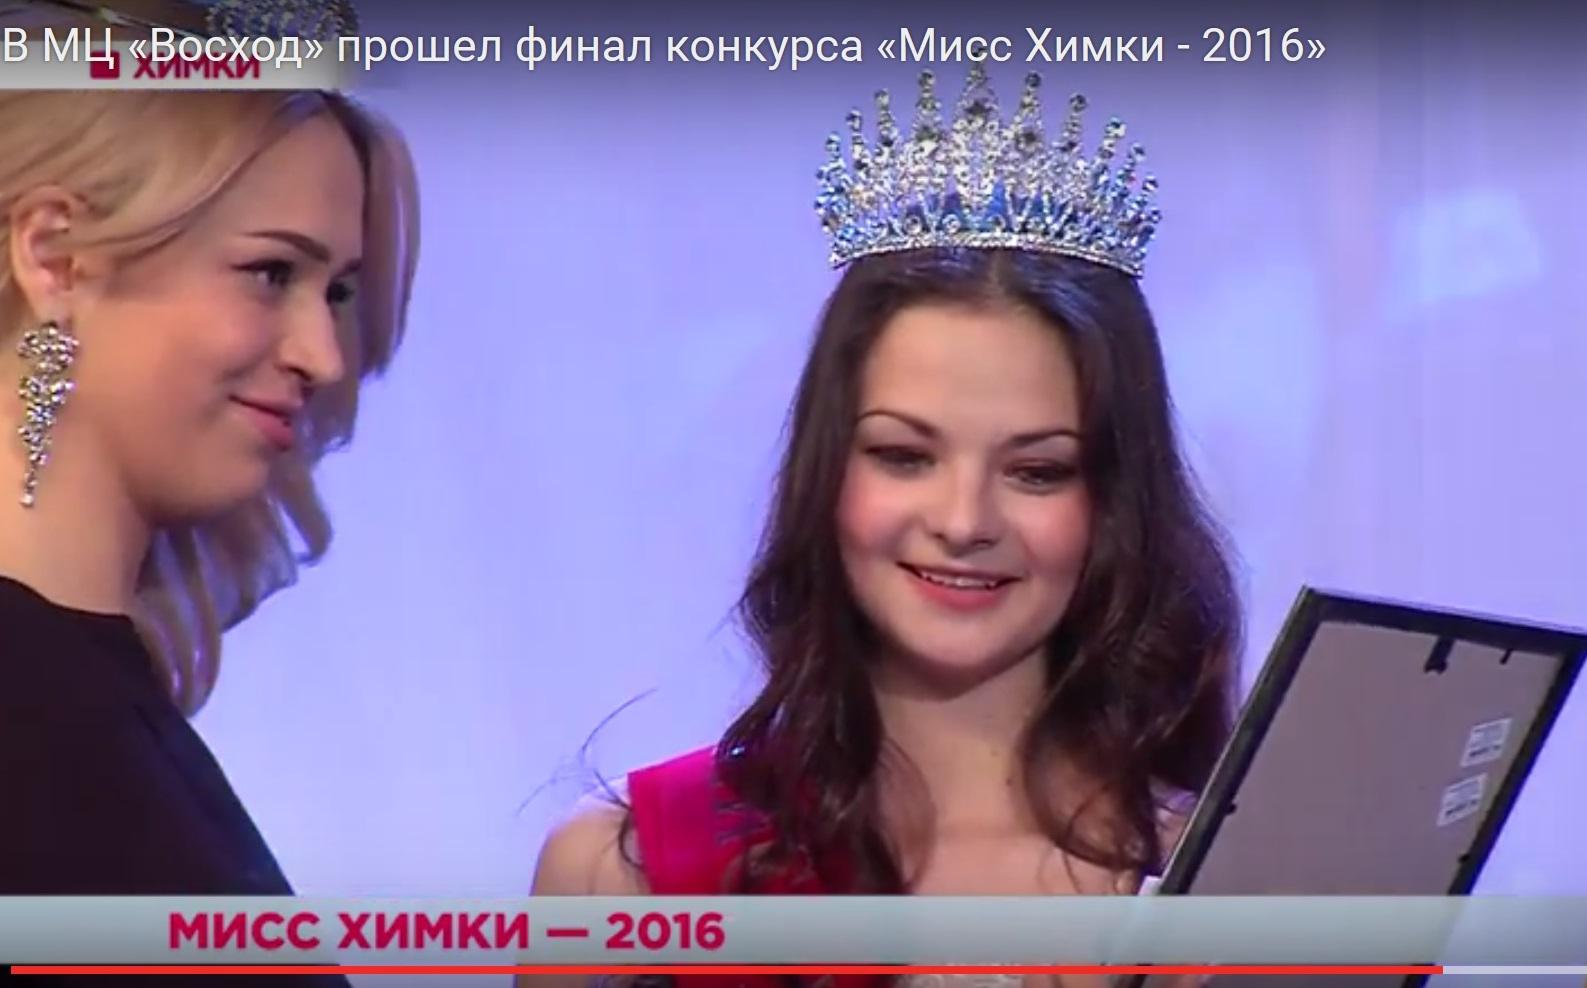 Мисс Химки 2016